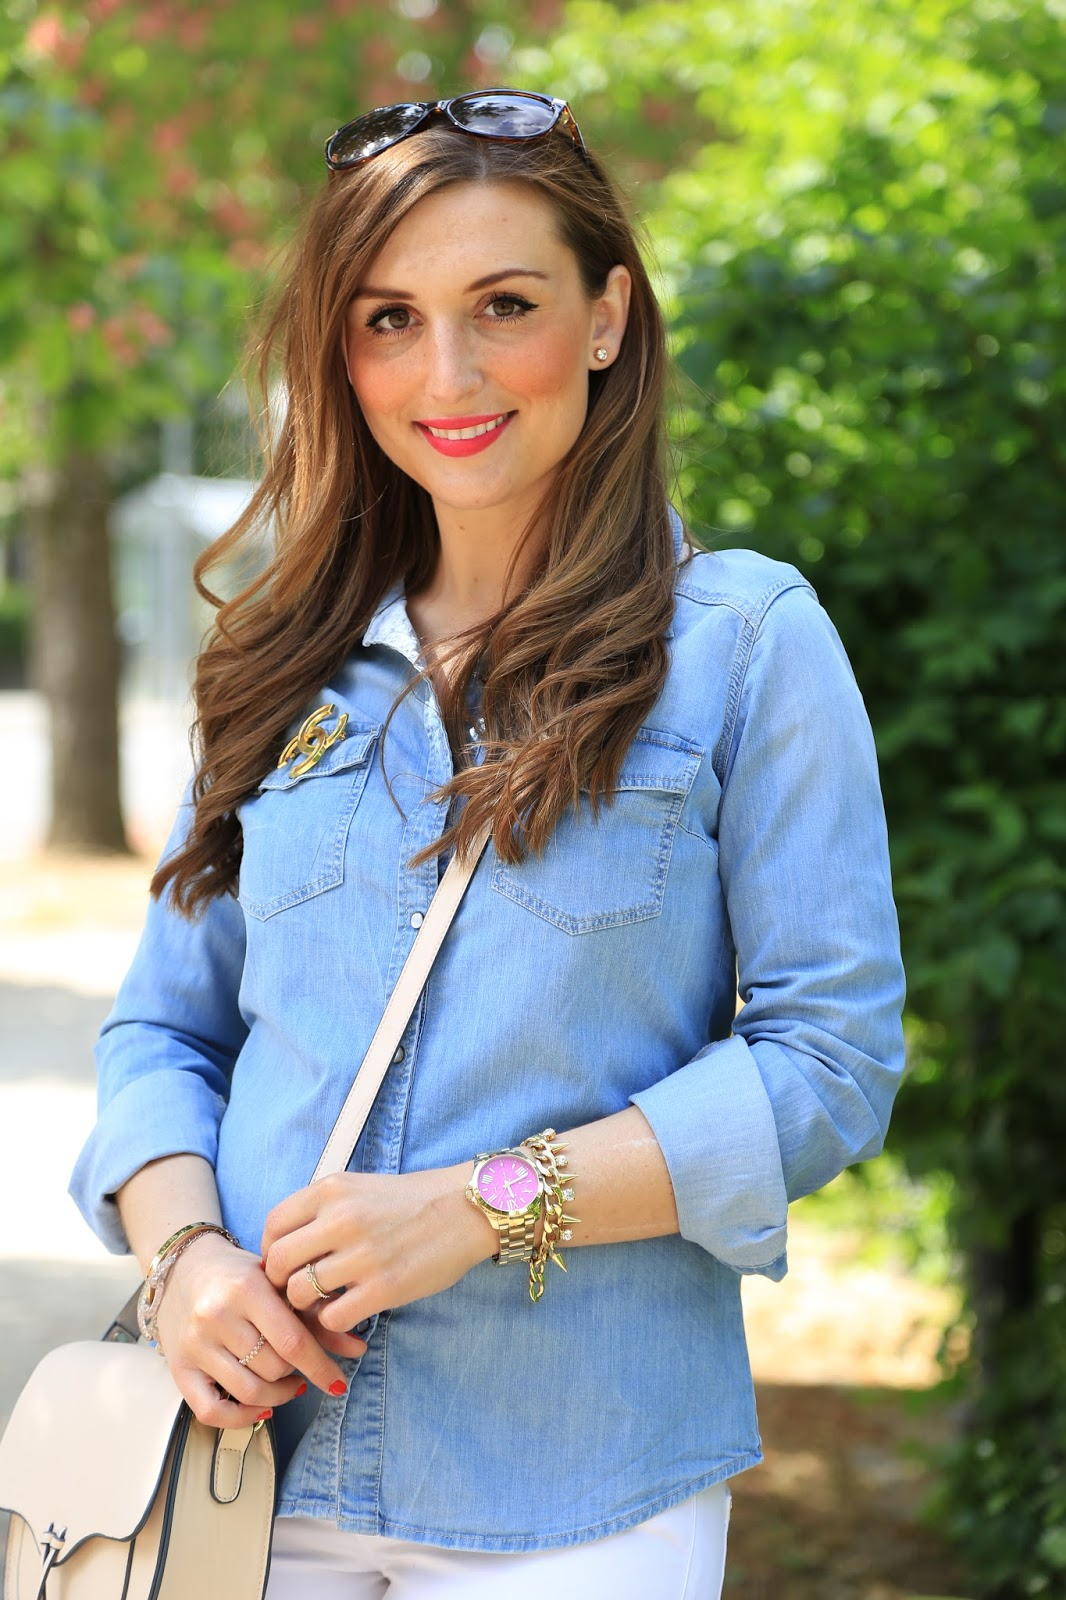 Jeanshemd kombinieren , wie kombiniere ich ein Jeanshemd, Jeanshemd Blogger , Fashionstylebyjohanna